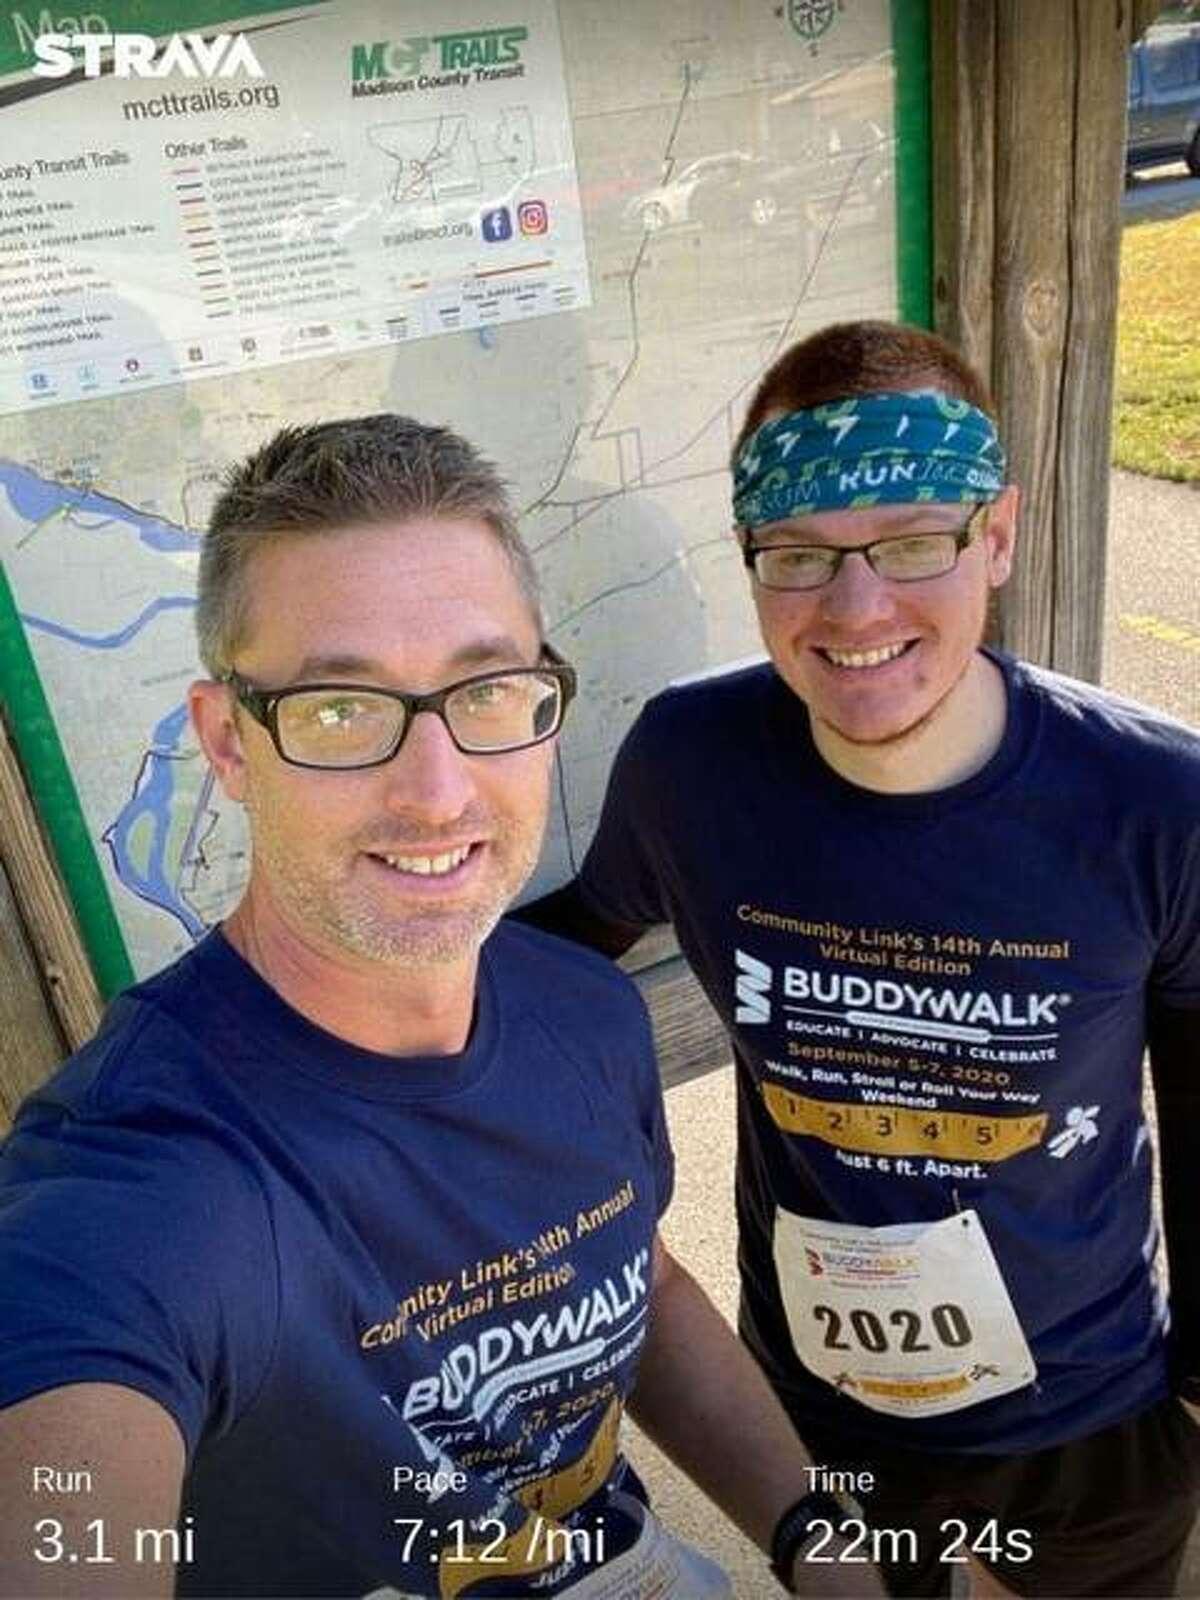 Brandon and Josh Baquet run the Virtual Buddy Walk 5K at Madison County Transit Trails.